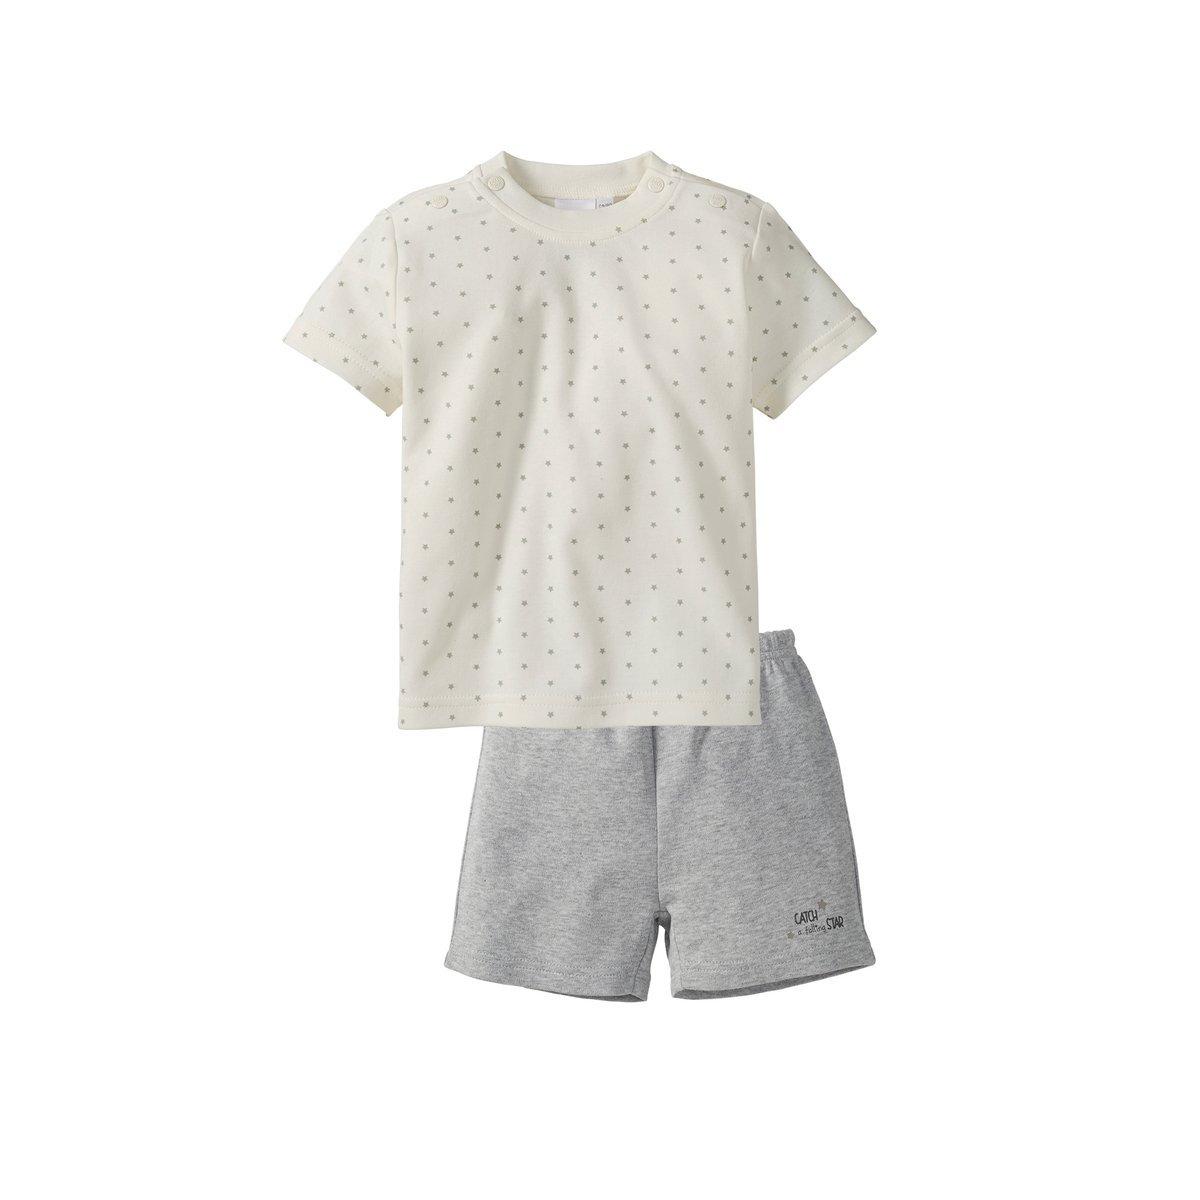 Bornino Schlafanzug kurz/Basics Baby Bekleidung/T-Shirt/Hose / Sterneallover/grau Melange